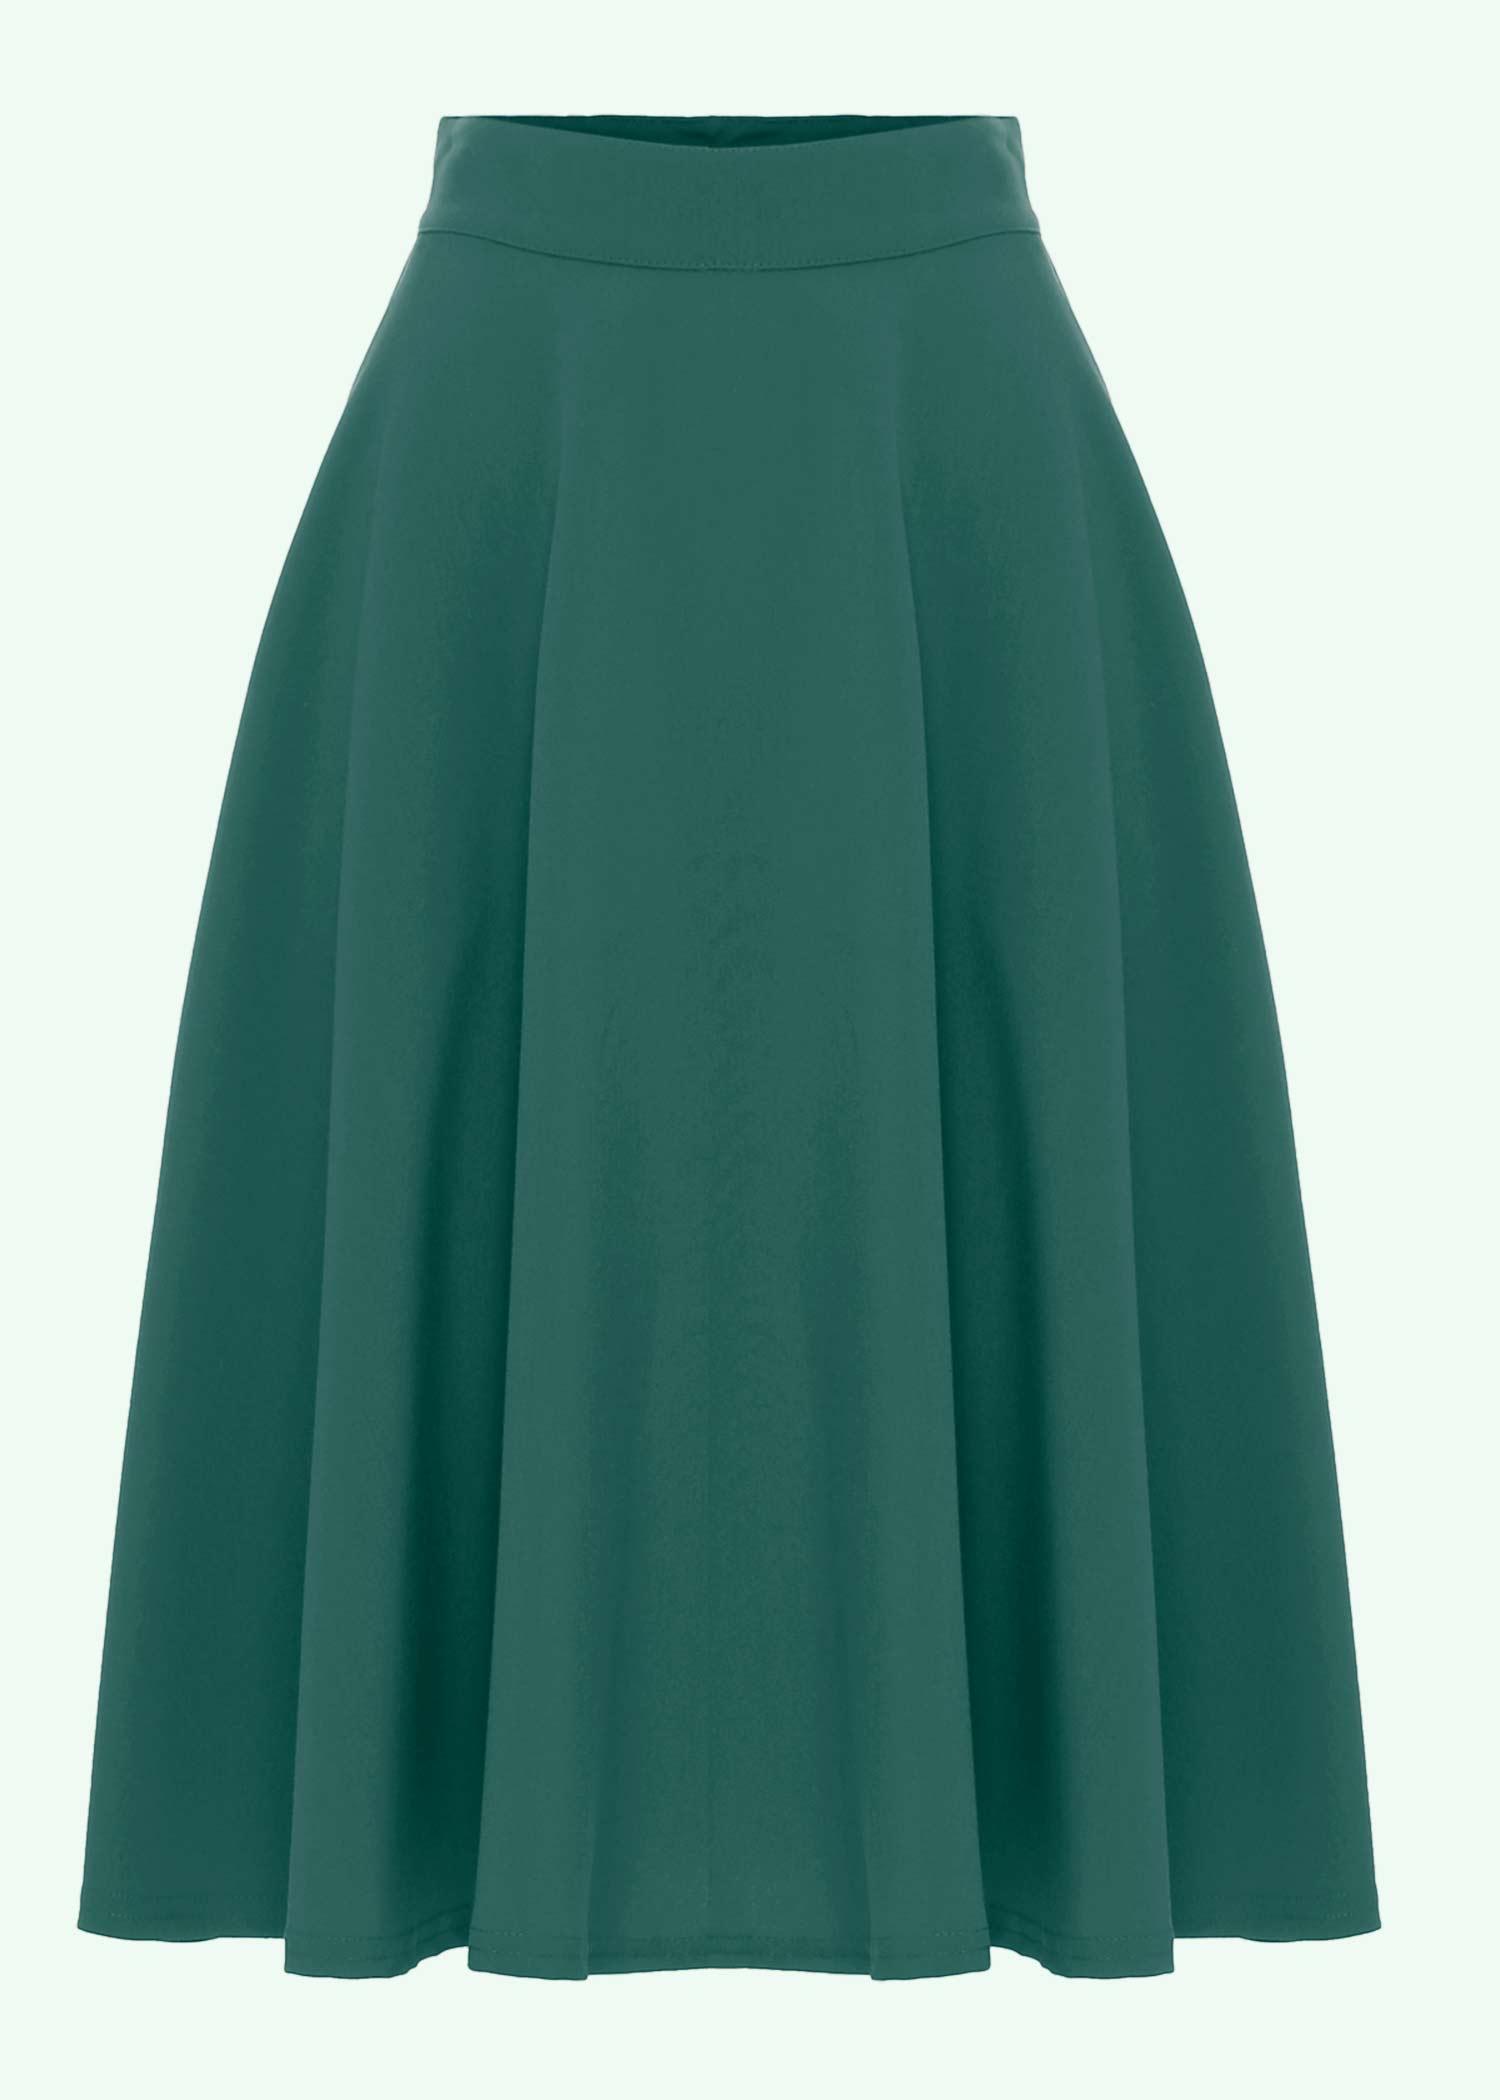 swing skirt in jade green